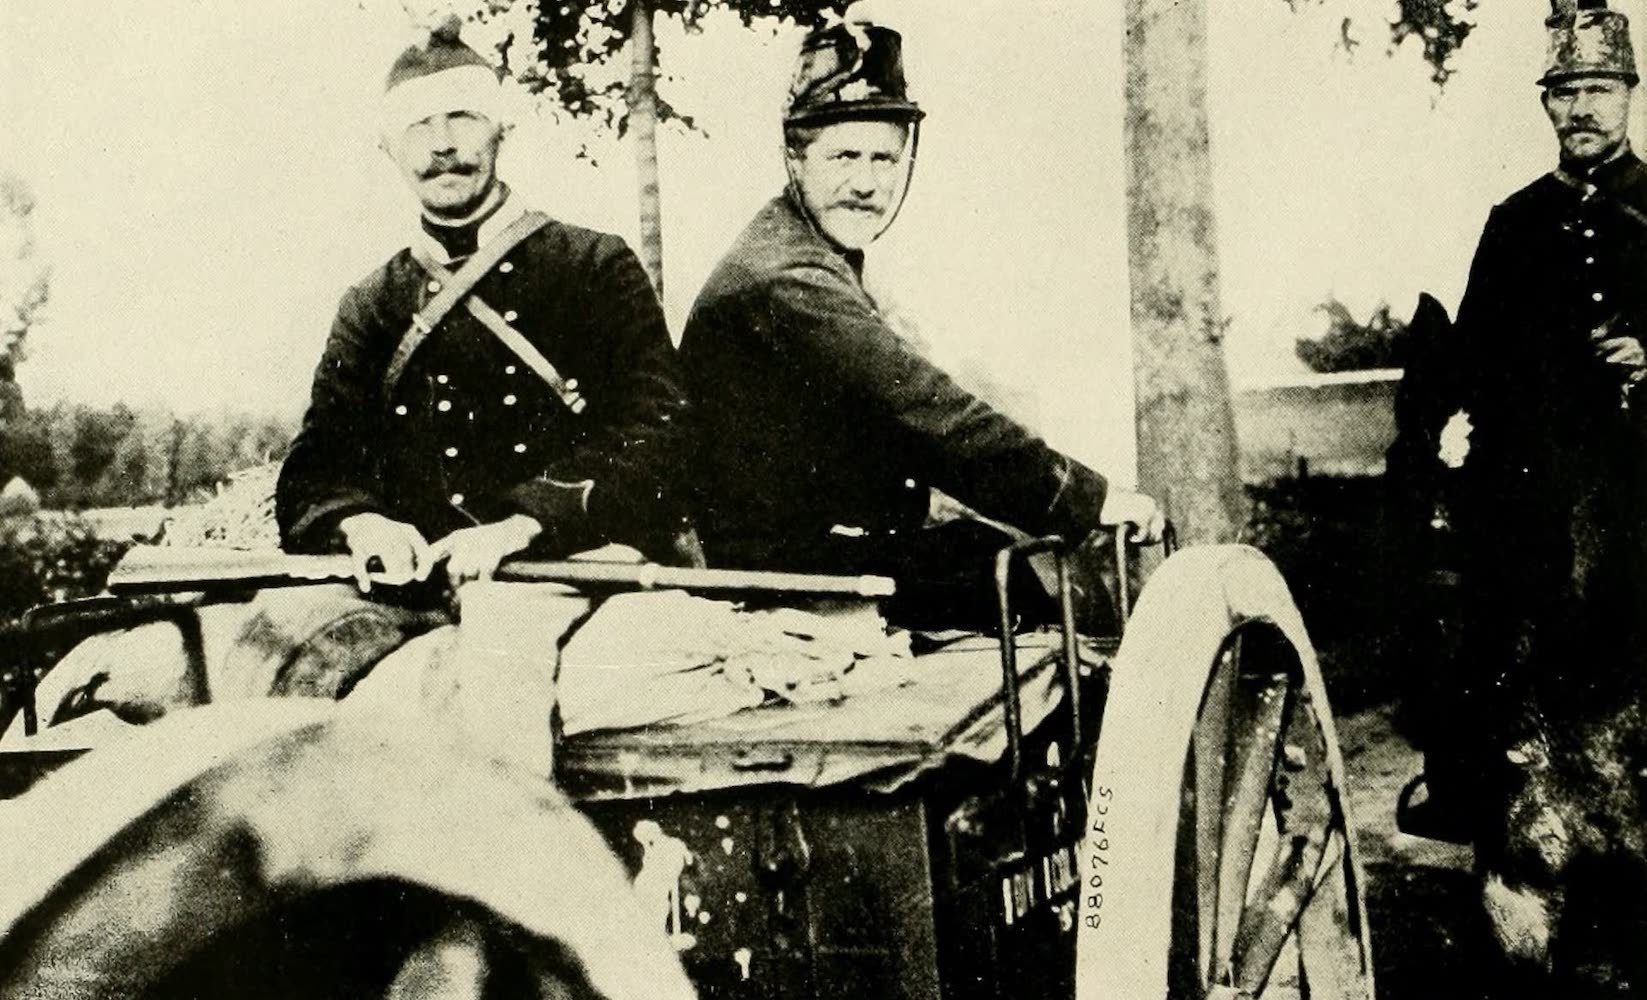 Laird & Lee's World's War Glimpses - The Undaunted Belgian Spirit (1914)